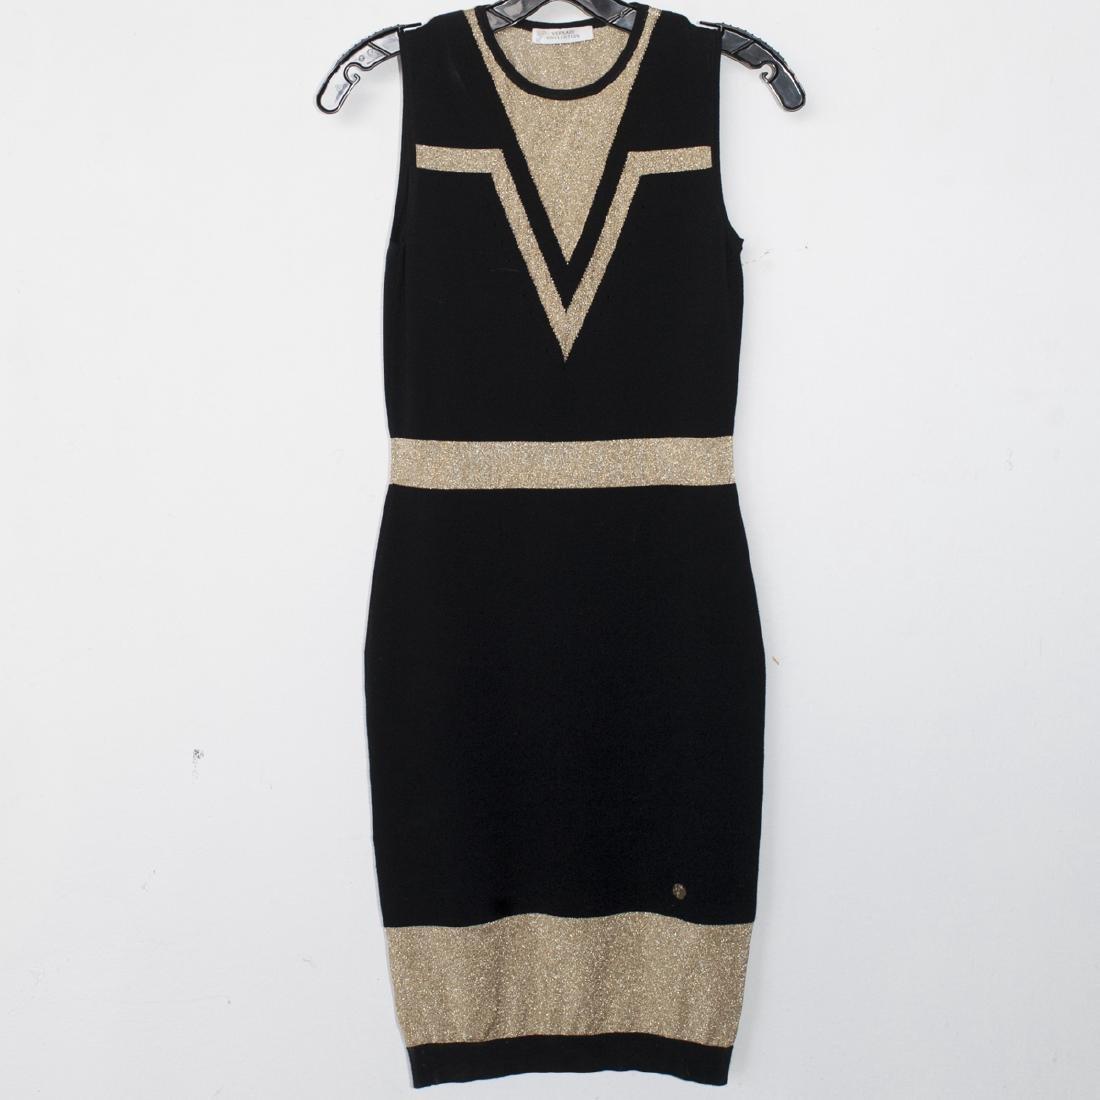 Gianni Versace Ladies Dress